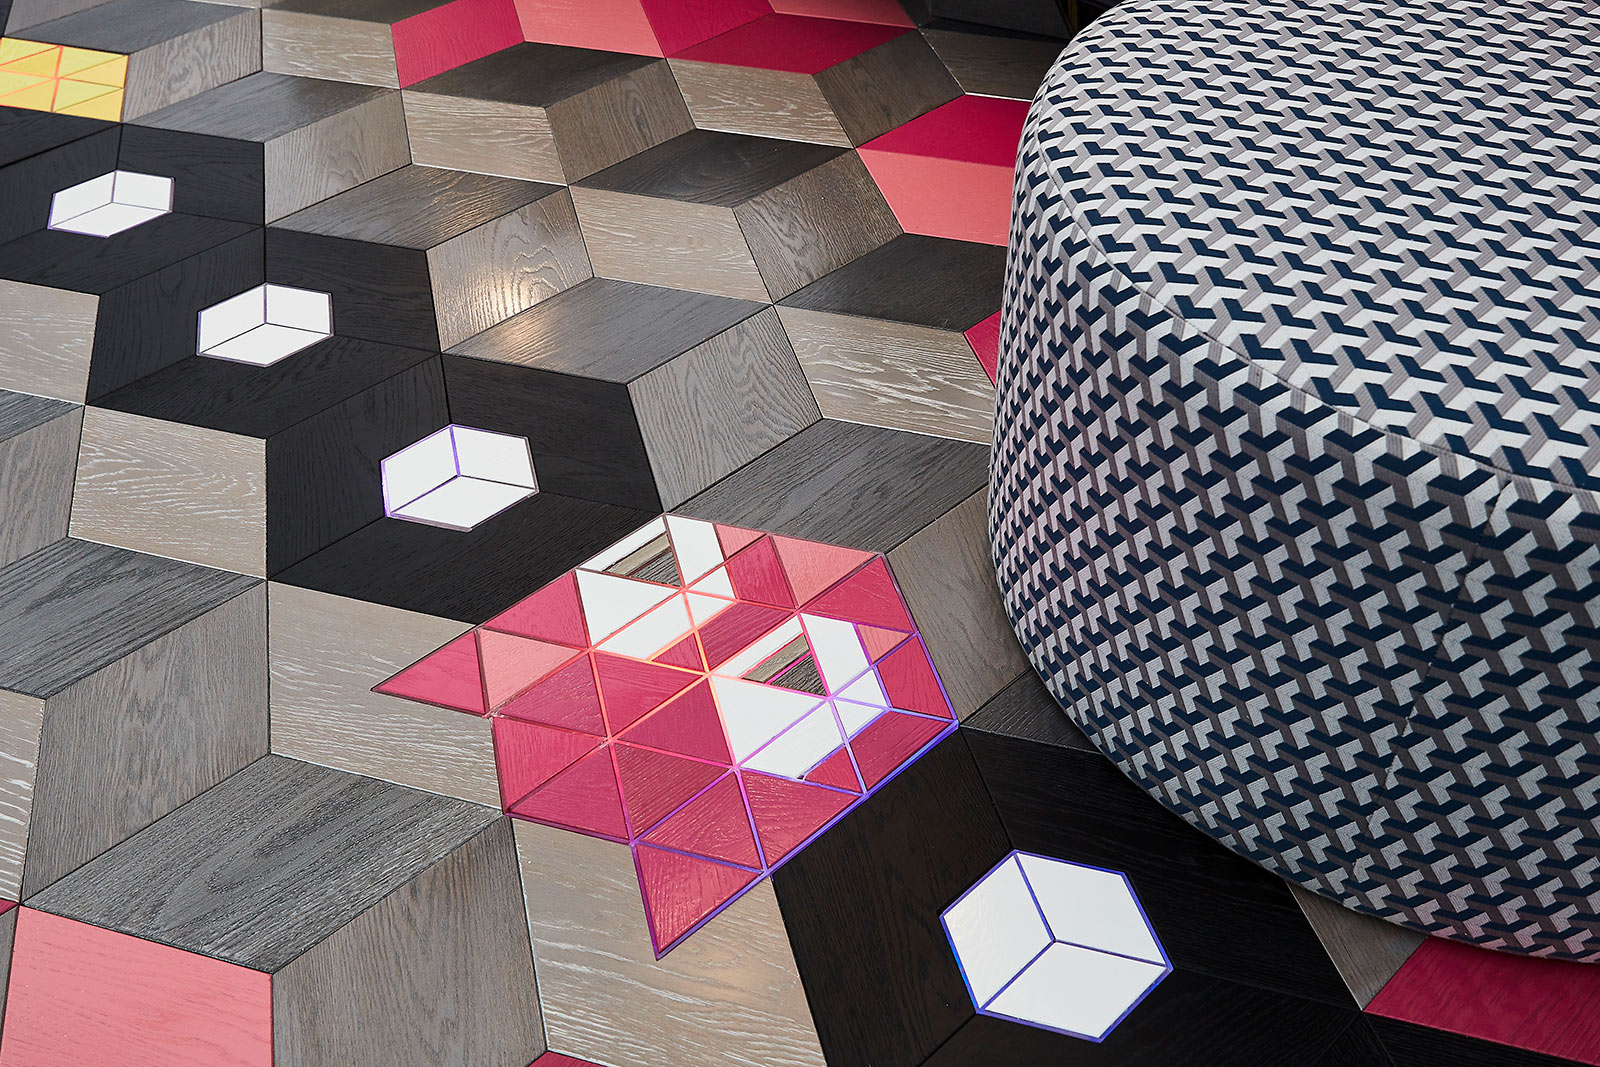 Detail of tiled flooring of interior design exhibition for Decorex 2018 by Studio Suss